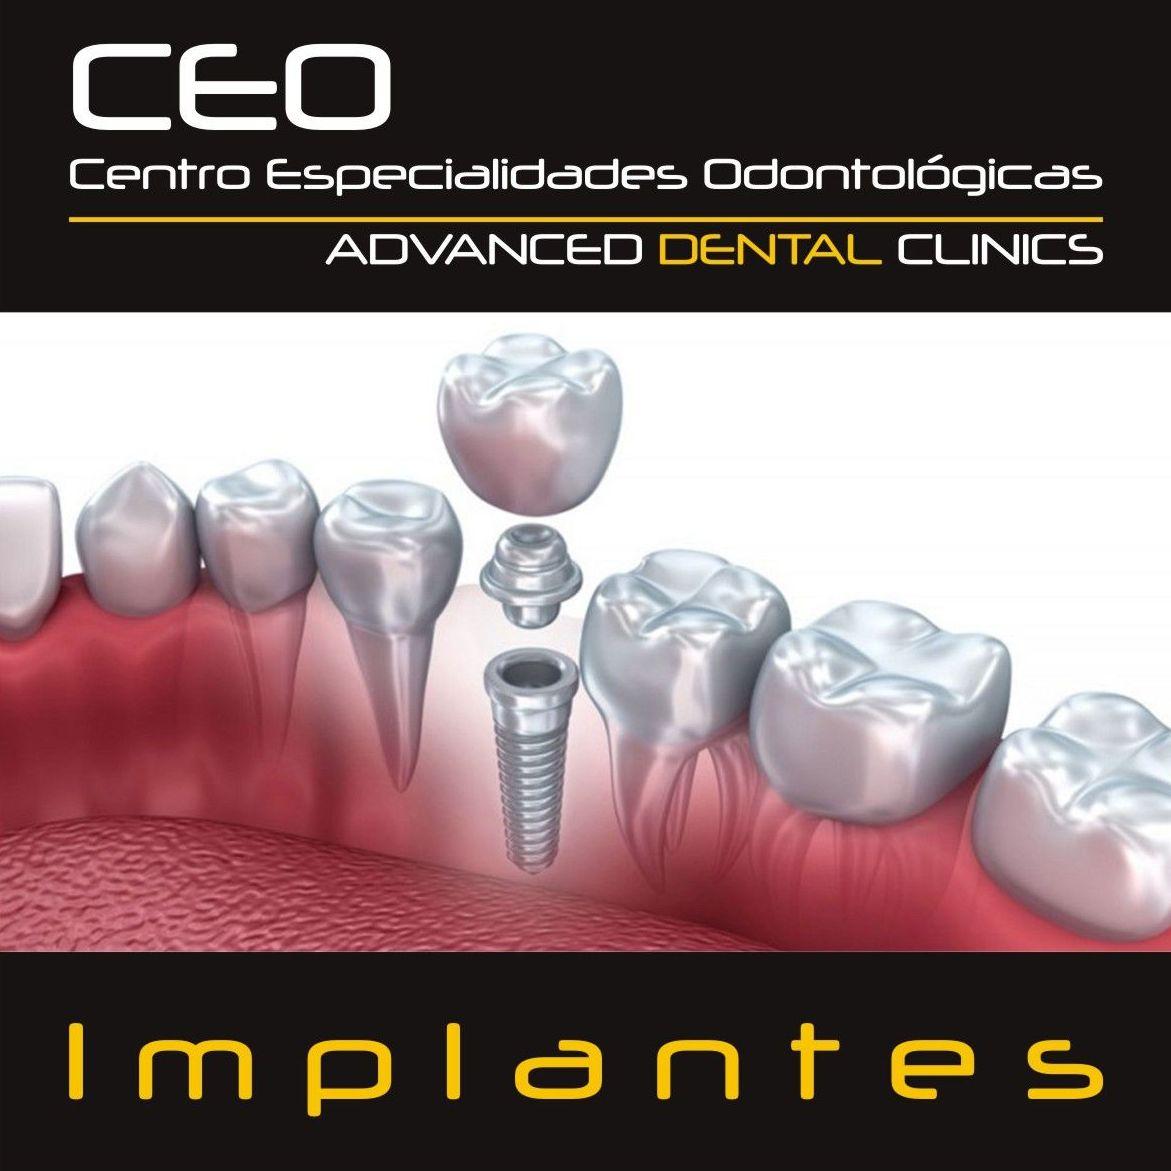 Implantes dentales: Tratamientos dentales de Centro Especialidades Odontologicas